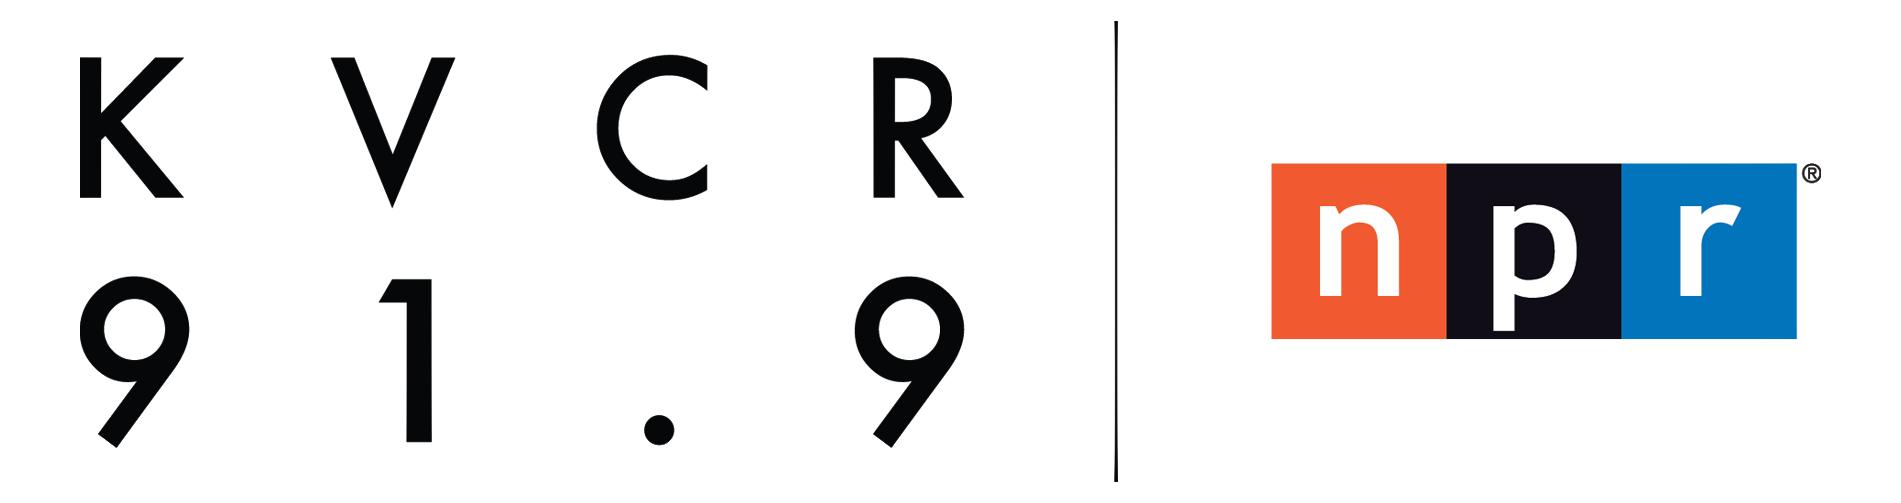 91.9 KVCR logo